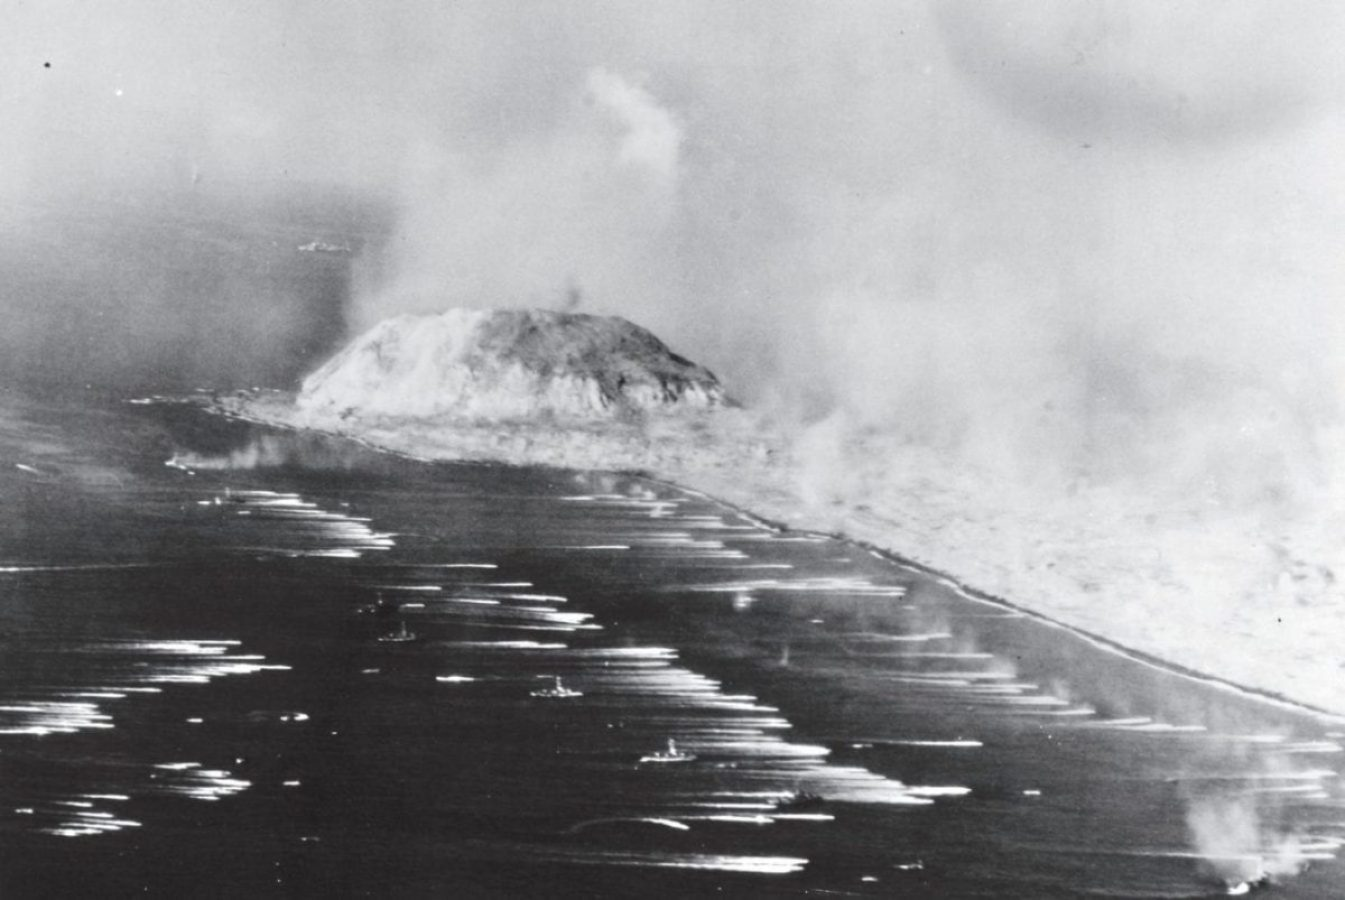 IWO JIMA landing Marines on D-day.